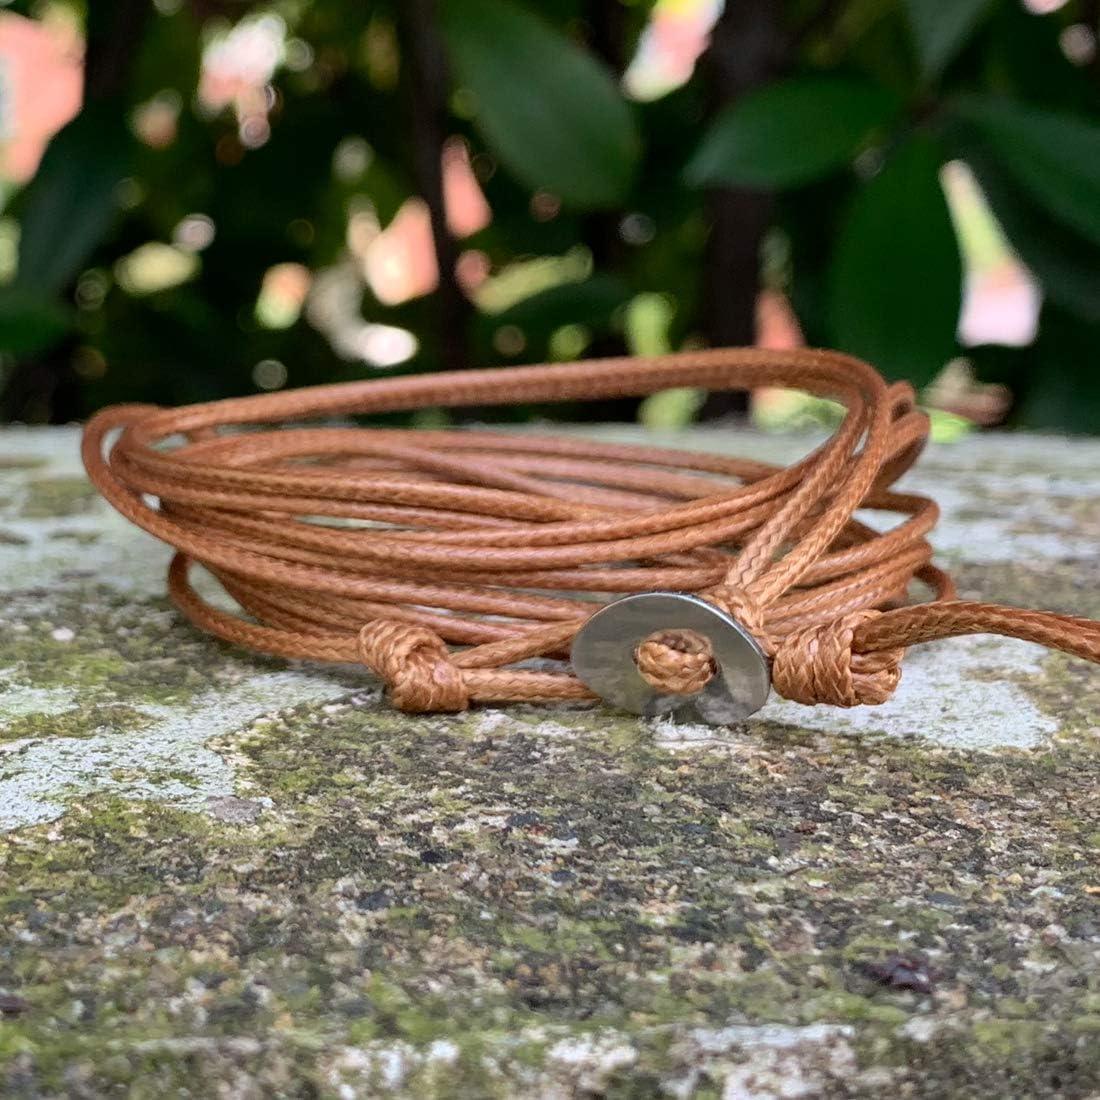 YGLINE Handmade Natural Labradorite//Ocean Jasper//ite Stone Druzy 5 Strands Wraps Boho Statement Women Bracelet Collection